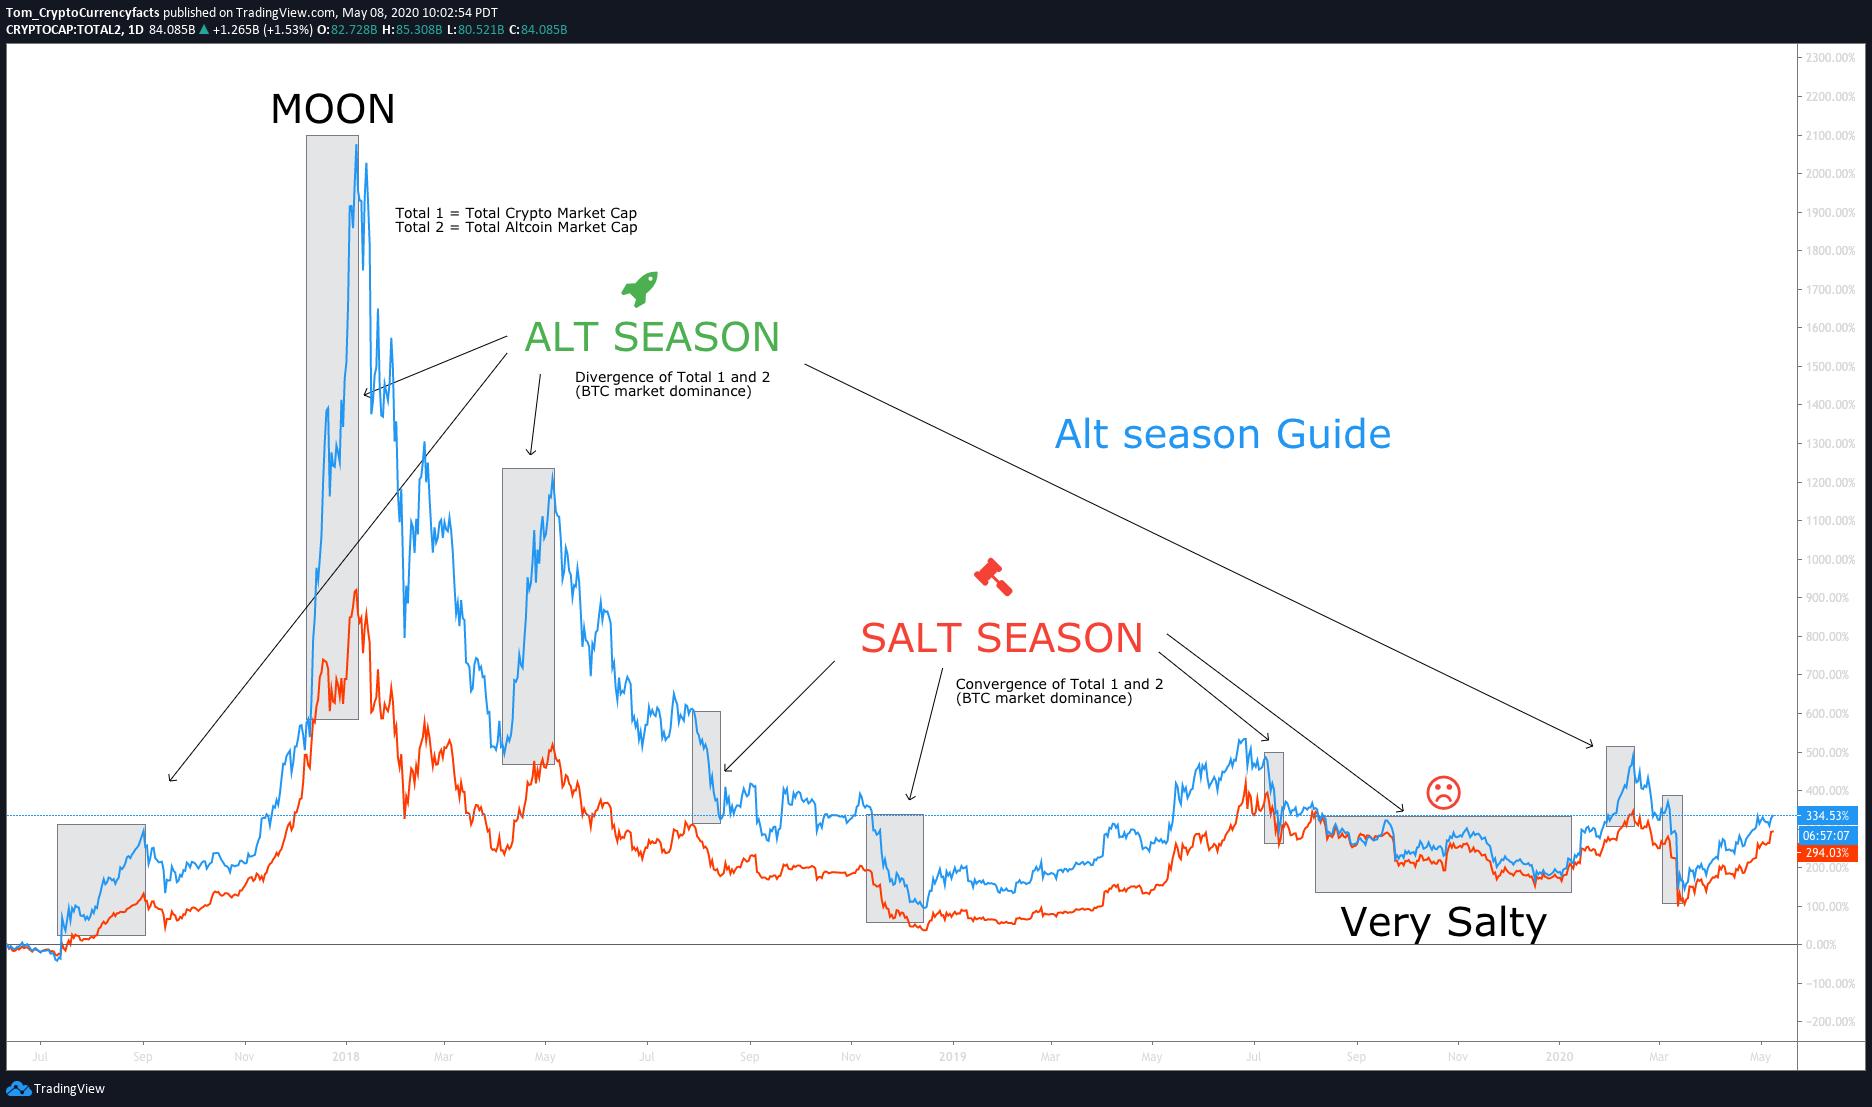 Alt Season